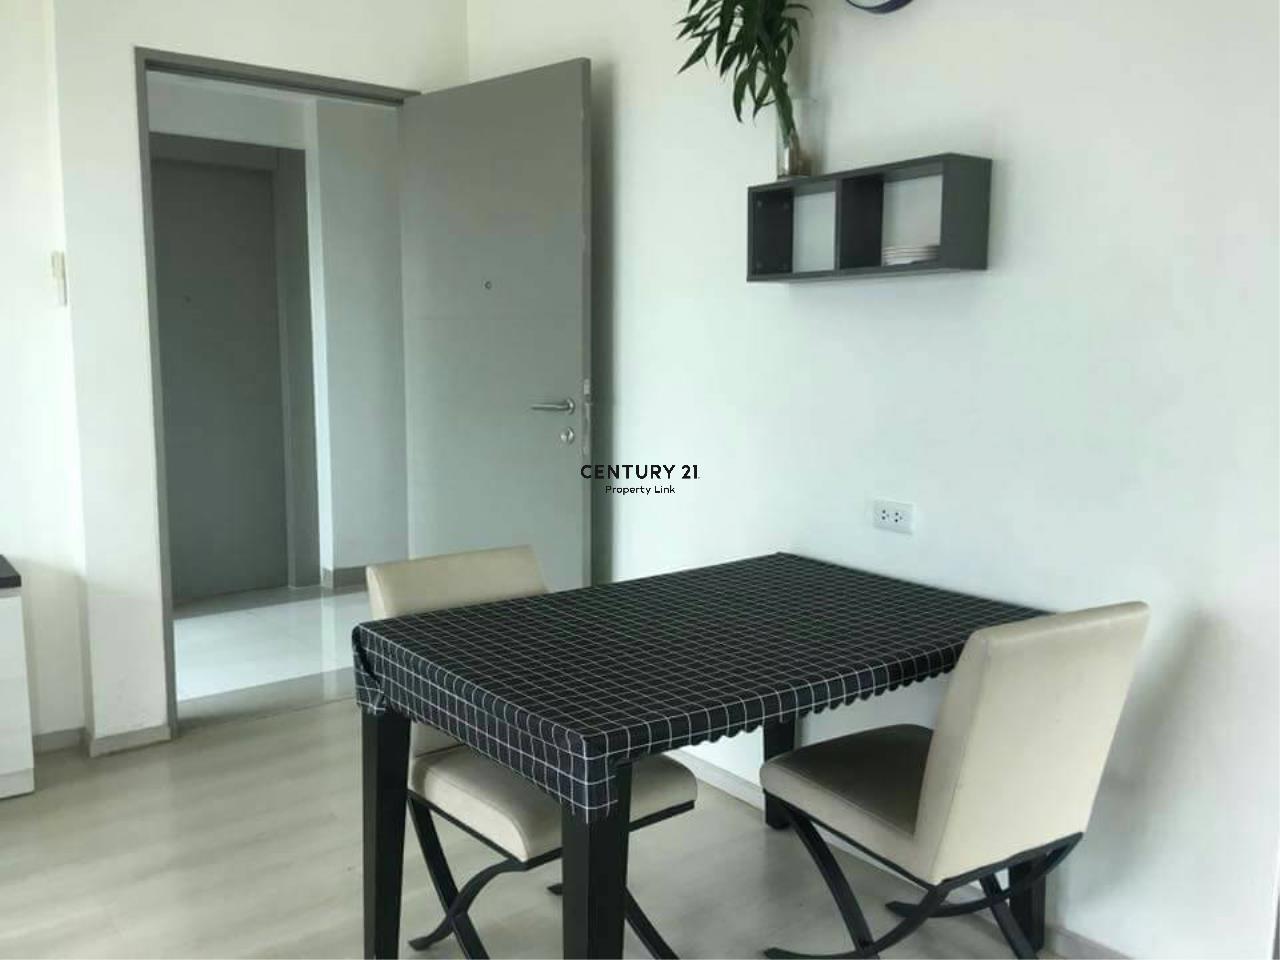 Century21 Property Link Agency's 39-CC-61596 Life Ratchadapisek Condo for Sale 1 bed Condo in bangkok MRT @Suthisarn / @Huai Khwang Sale 4.3 M. 6